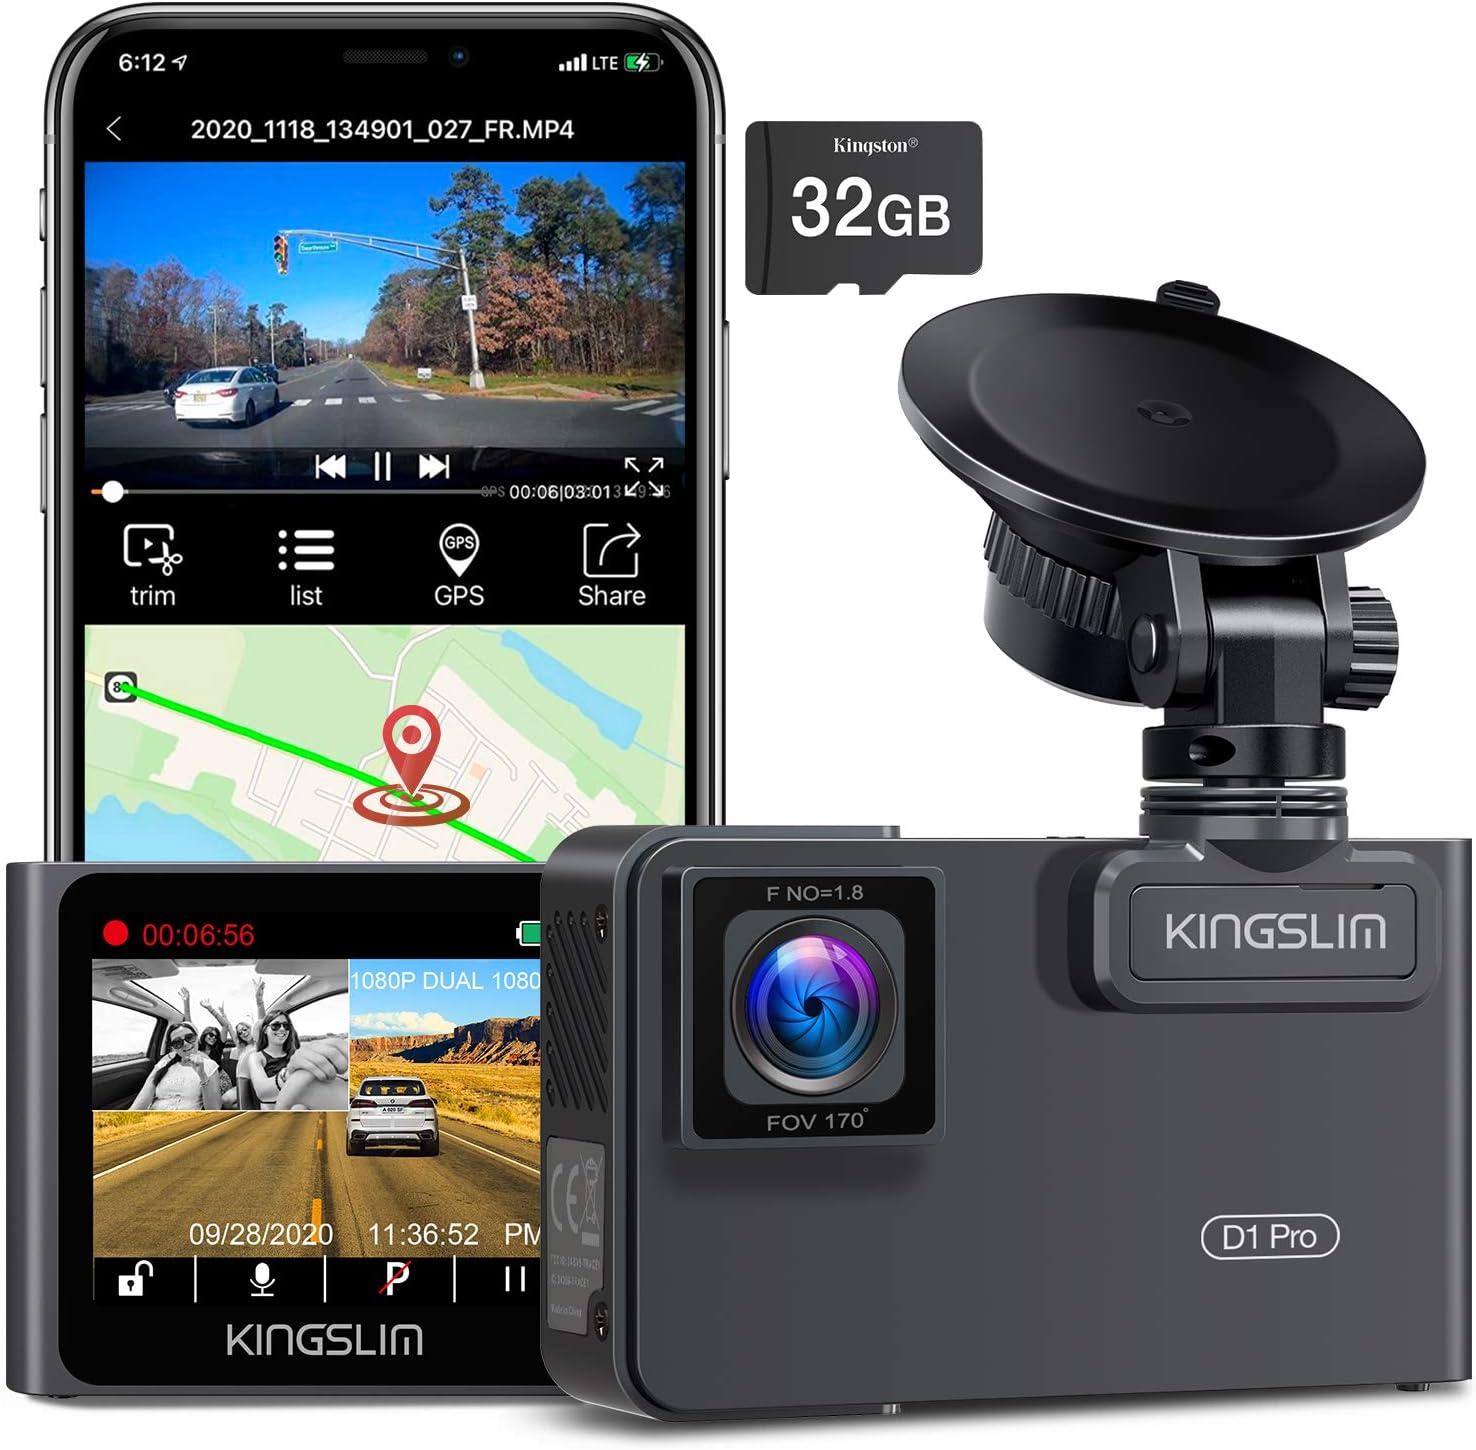 Kingslim D1 Pro Dual Dash Cam with Wi-Fi GPS